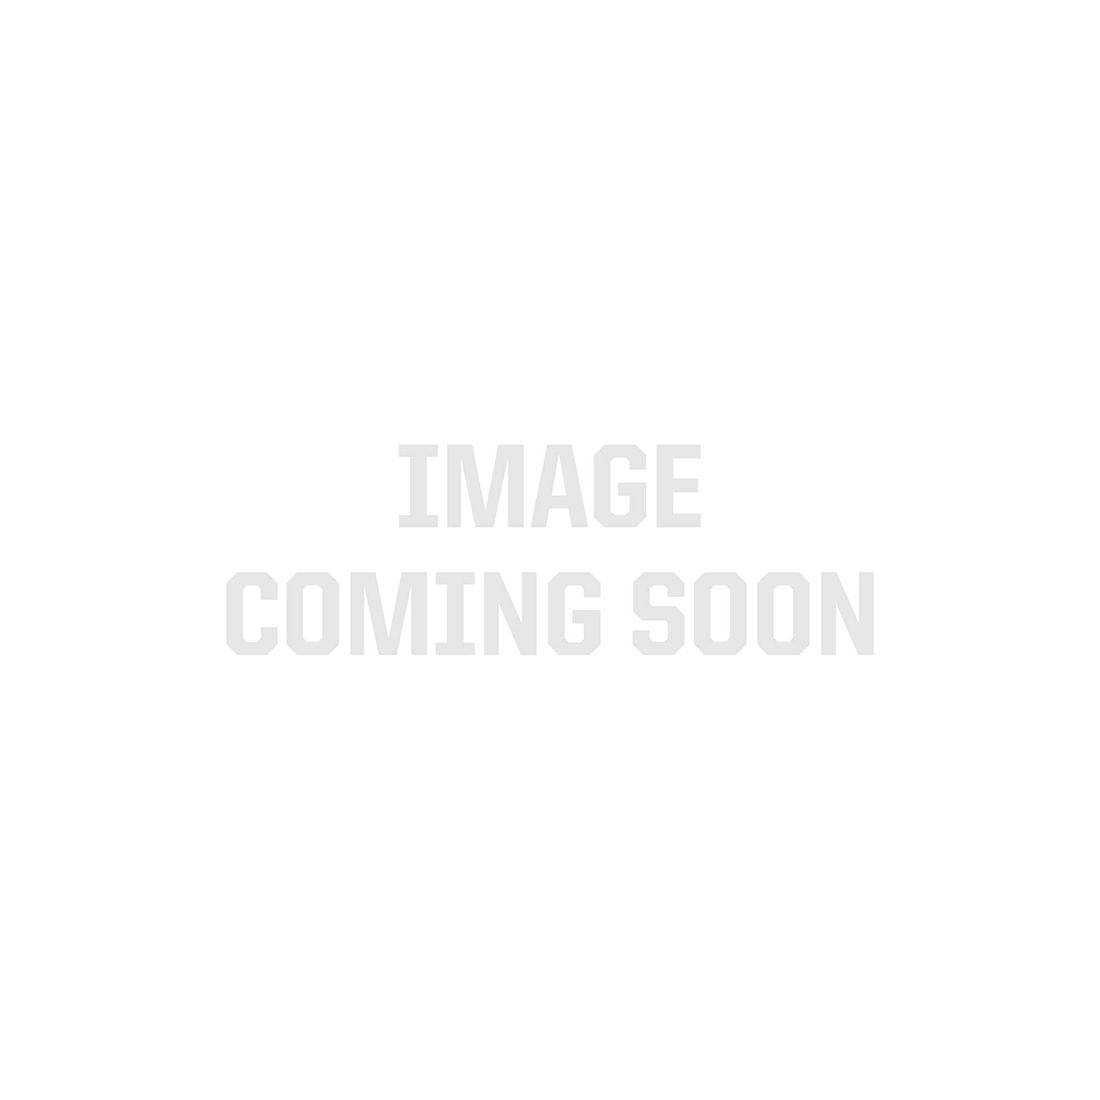 Waterproof Side Mount Neutral White 3014 Side View LED Strip Light, 96/m, 8mm wide, Sample Kit